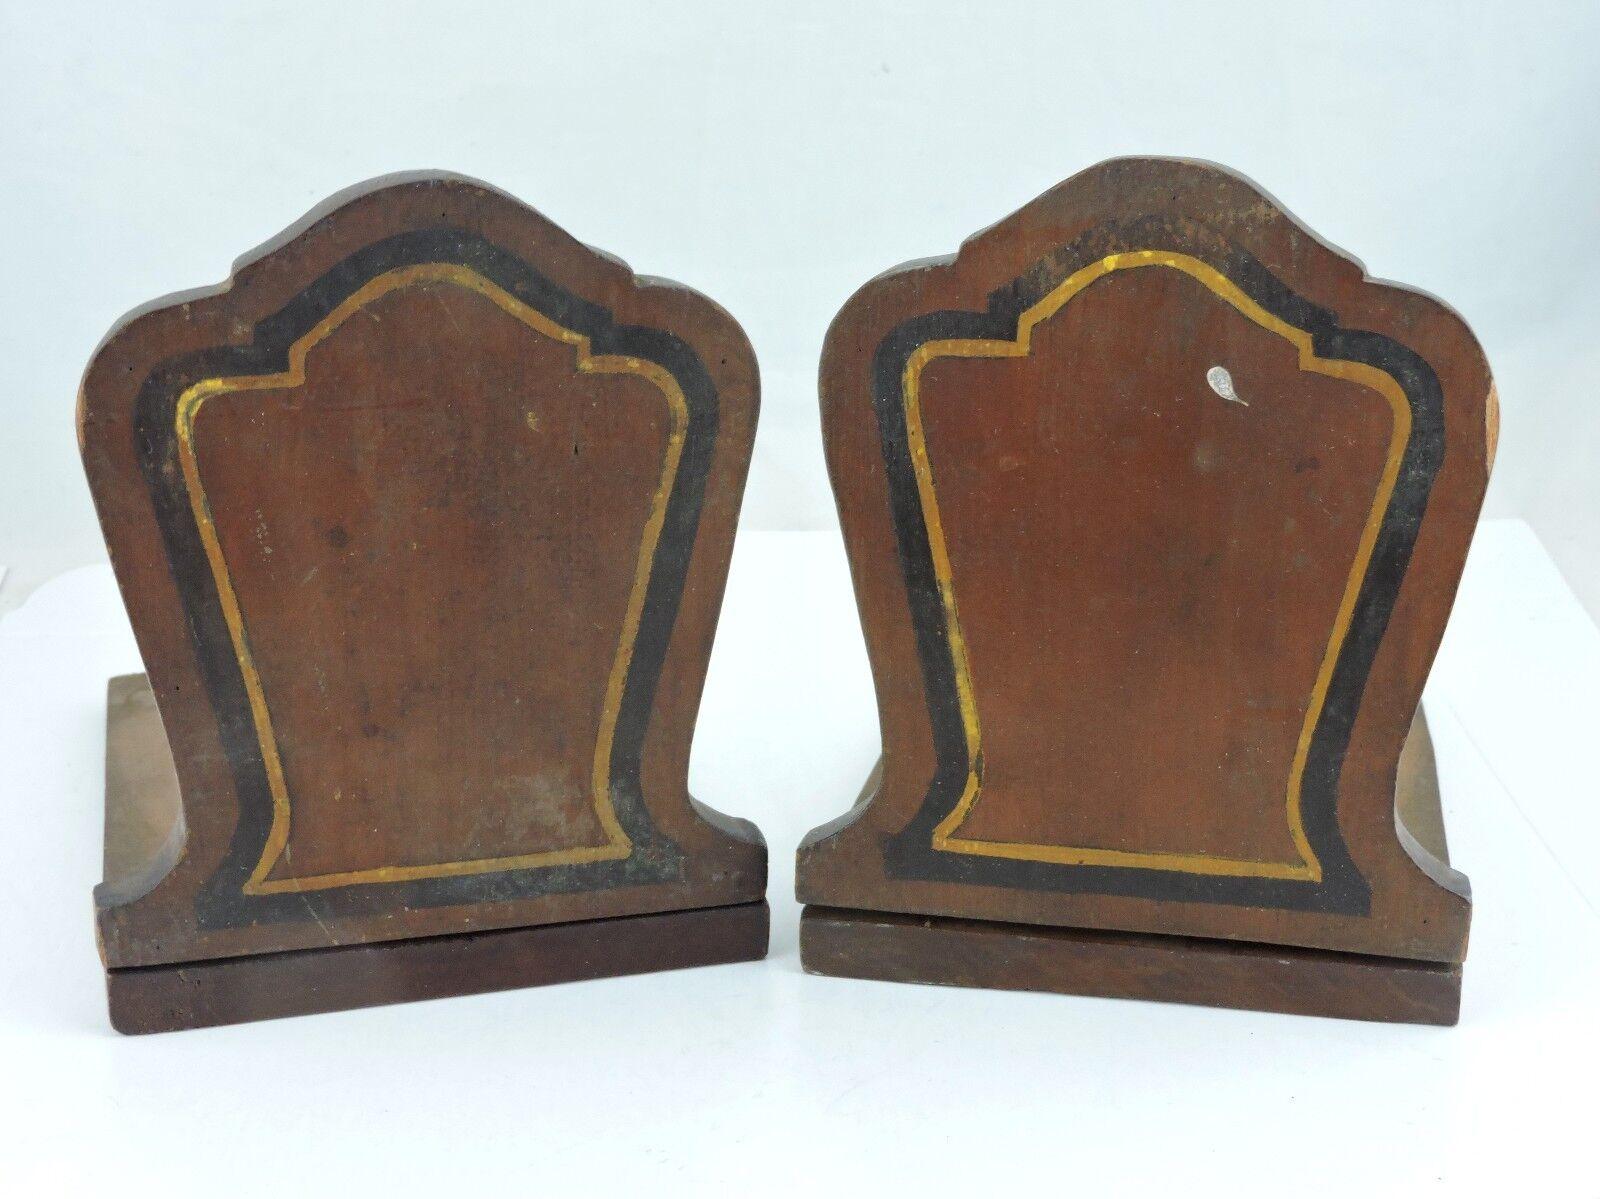 Vintage Primitive Handmade Homemade Wooden Bookends Book Ends Arts & Crafts